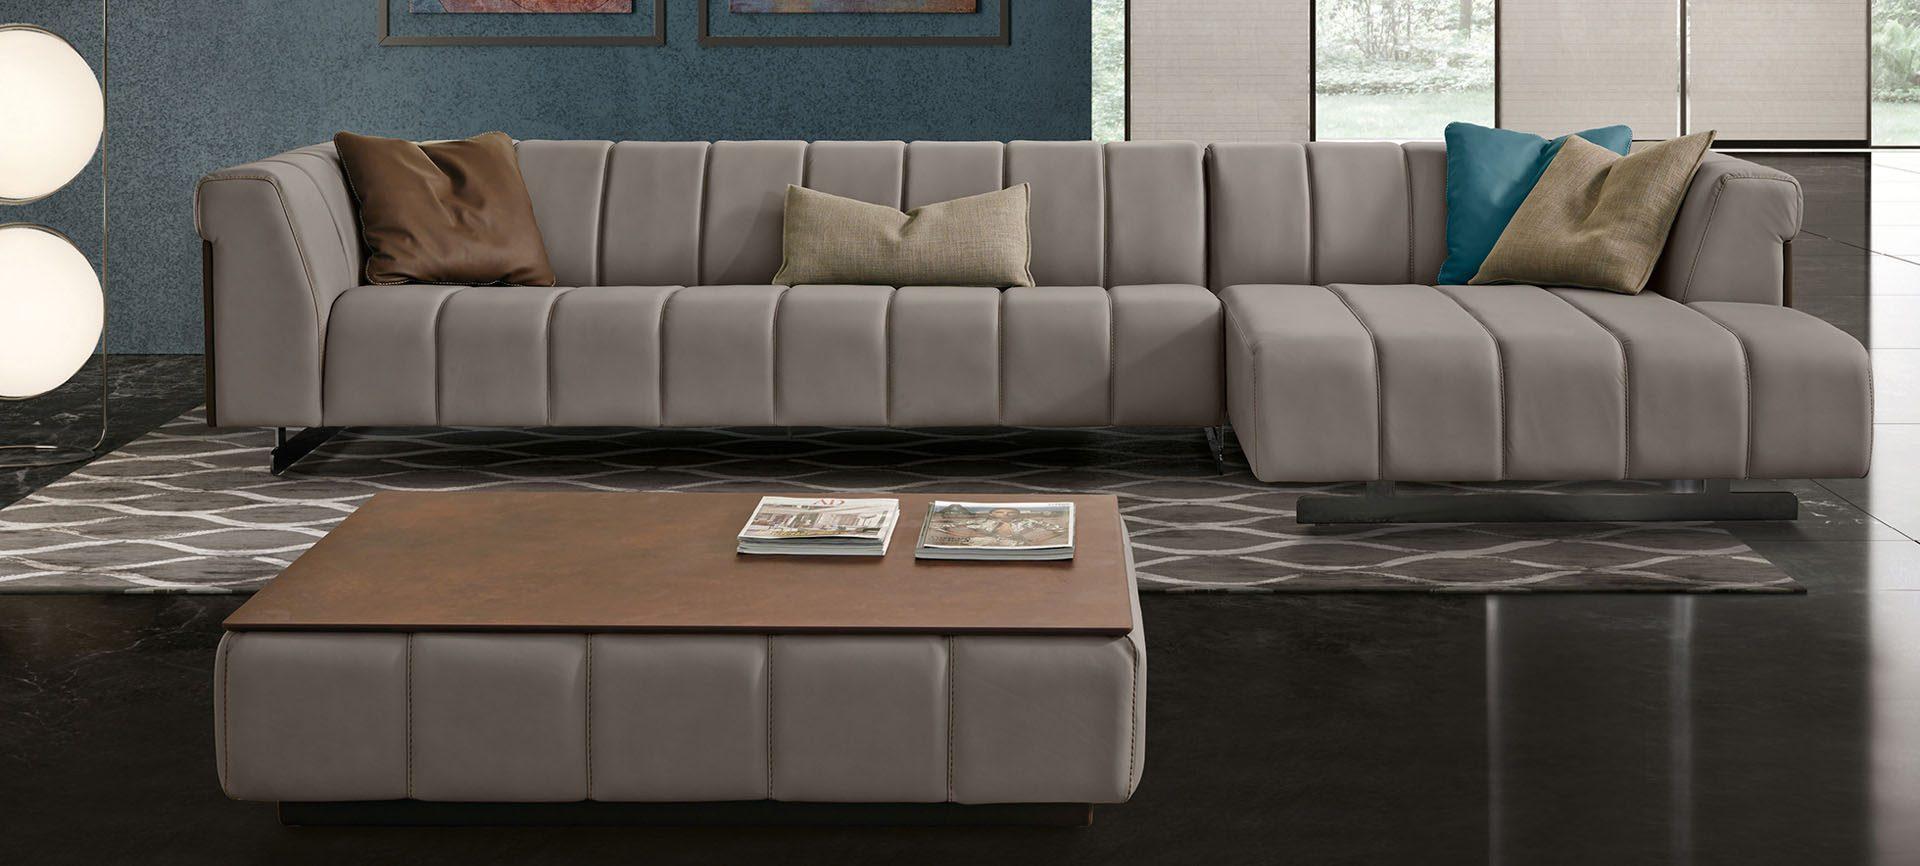 Nautilus Lounge